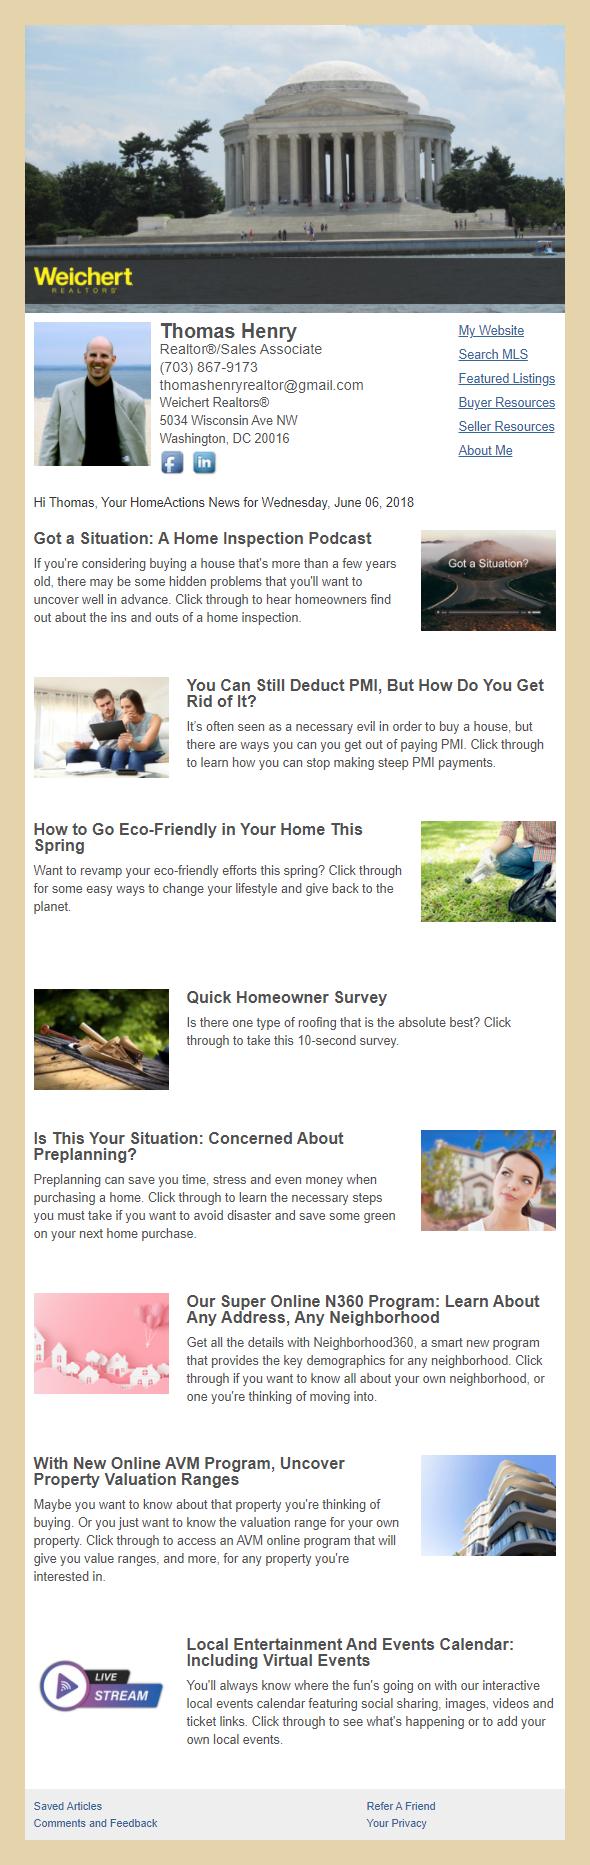 Weichert REALTORS® - HomeActions Sample Email Newsletter